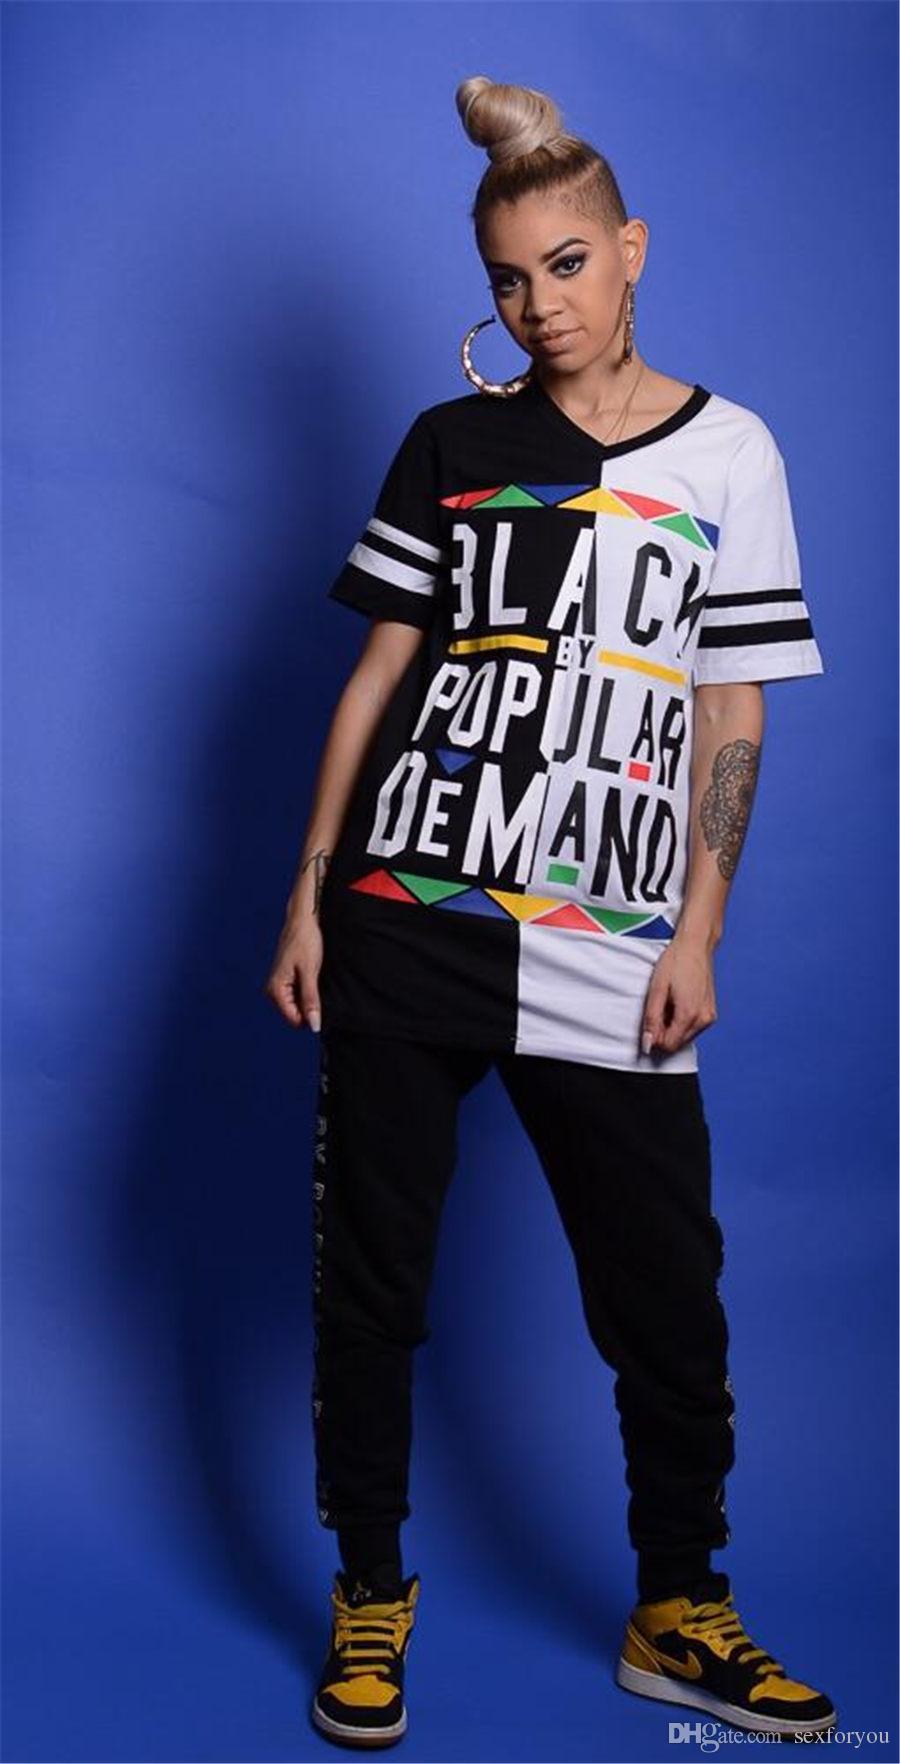 883eddab30b7ef Women T Shirt Tops Black Popular Demand Print Summer Casual Woman Shirt Top  Crew Neck Short Sleeve Print Ringer Tee Tshirts Designs T Shirt S From  Sexforyou ...